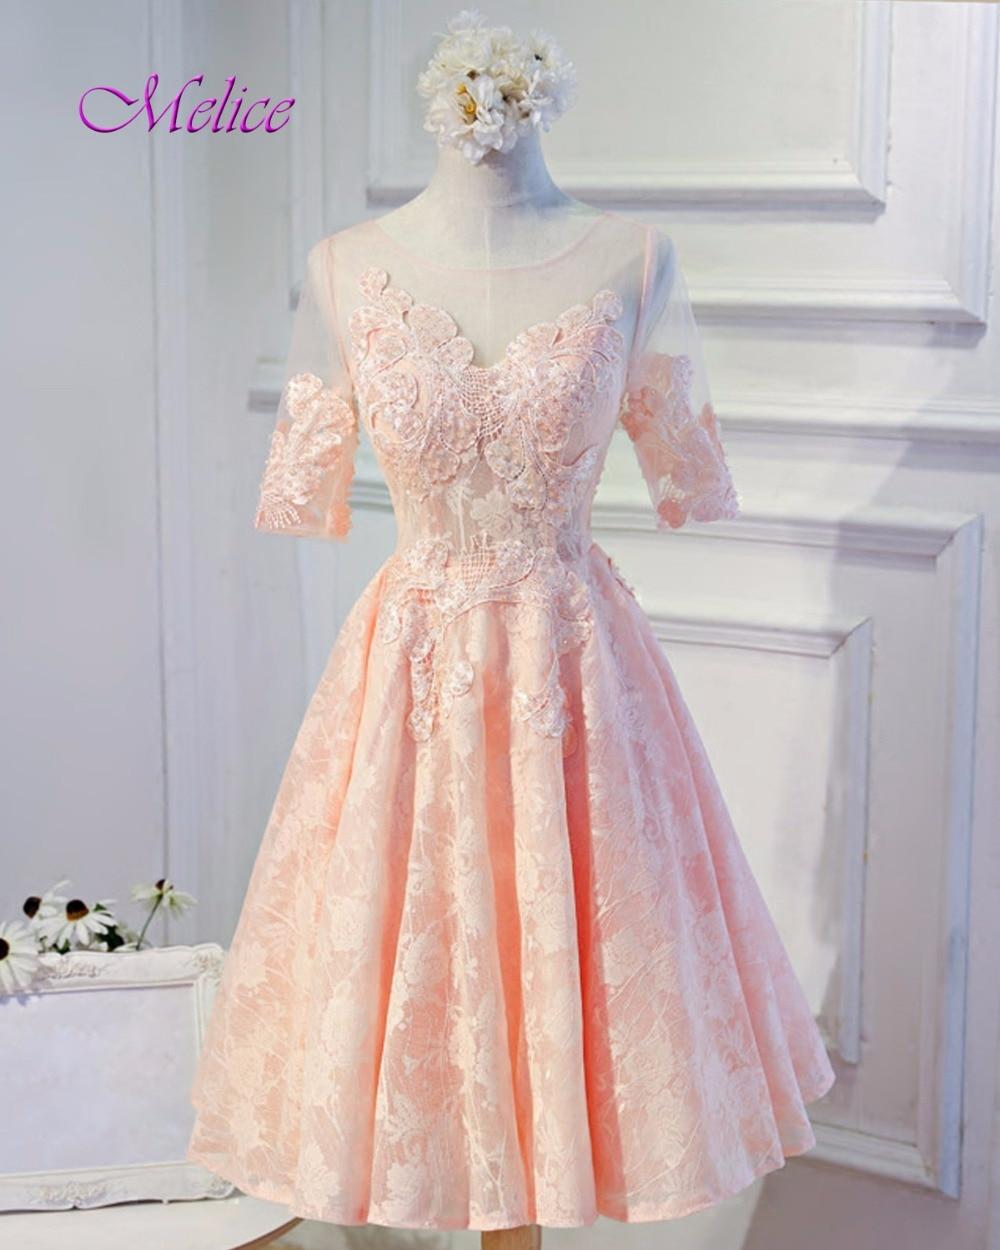 Melice New Fashion O-neck Half Sleeve Pink Princess Lace   Prom     Dress   2019 Graceful Appliques Formal Party Gown Vestido de Festa